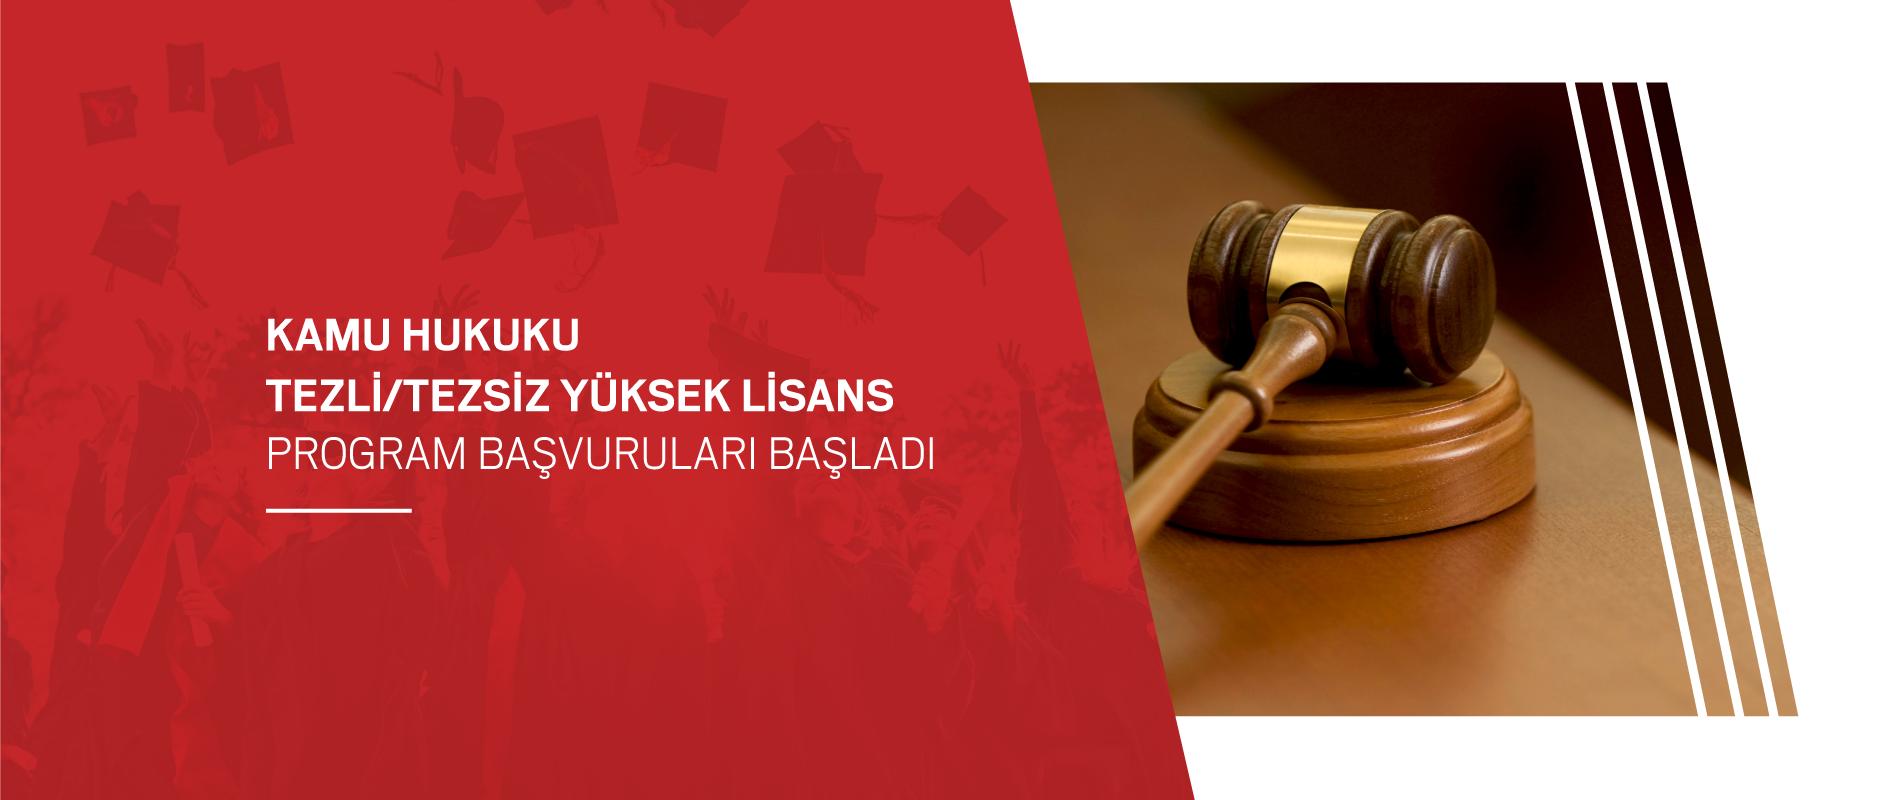 Yüksek Lisans Hukuk 2021